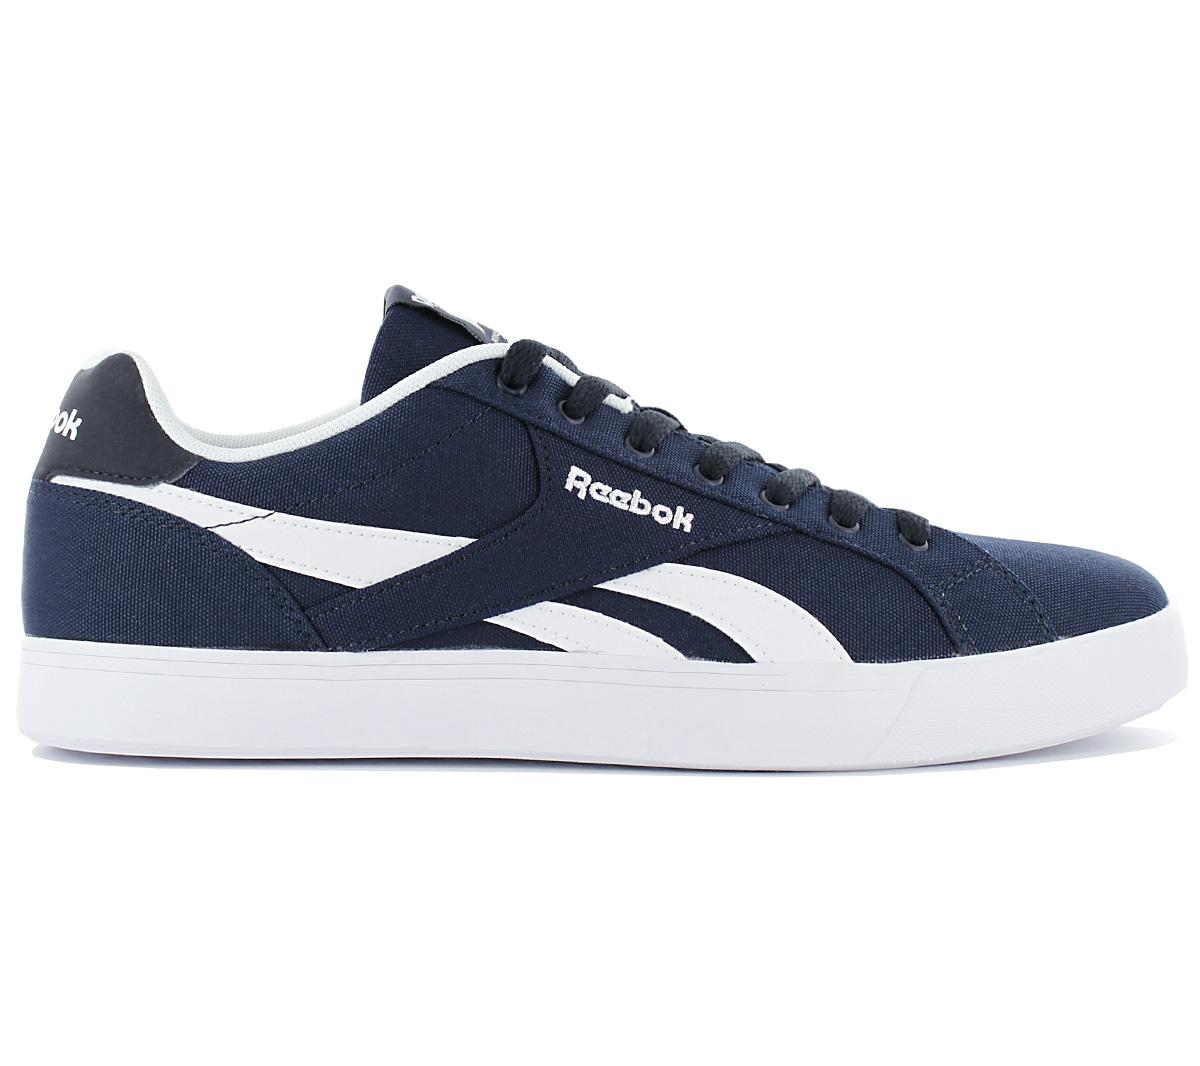 neuer Stil & Luxus Rabatt-Sammlung tolle Preise Details about Reebok Royal Complete 2 Lt Men's Sneaker Canvas Shoes  Sneakers Navy Blue Rbk